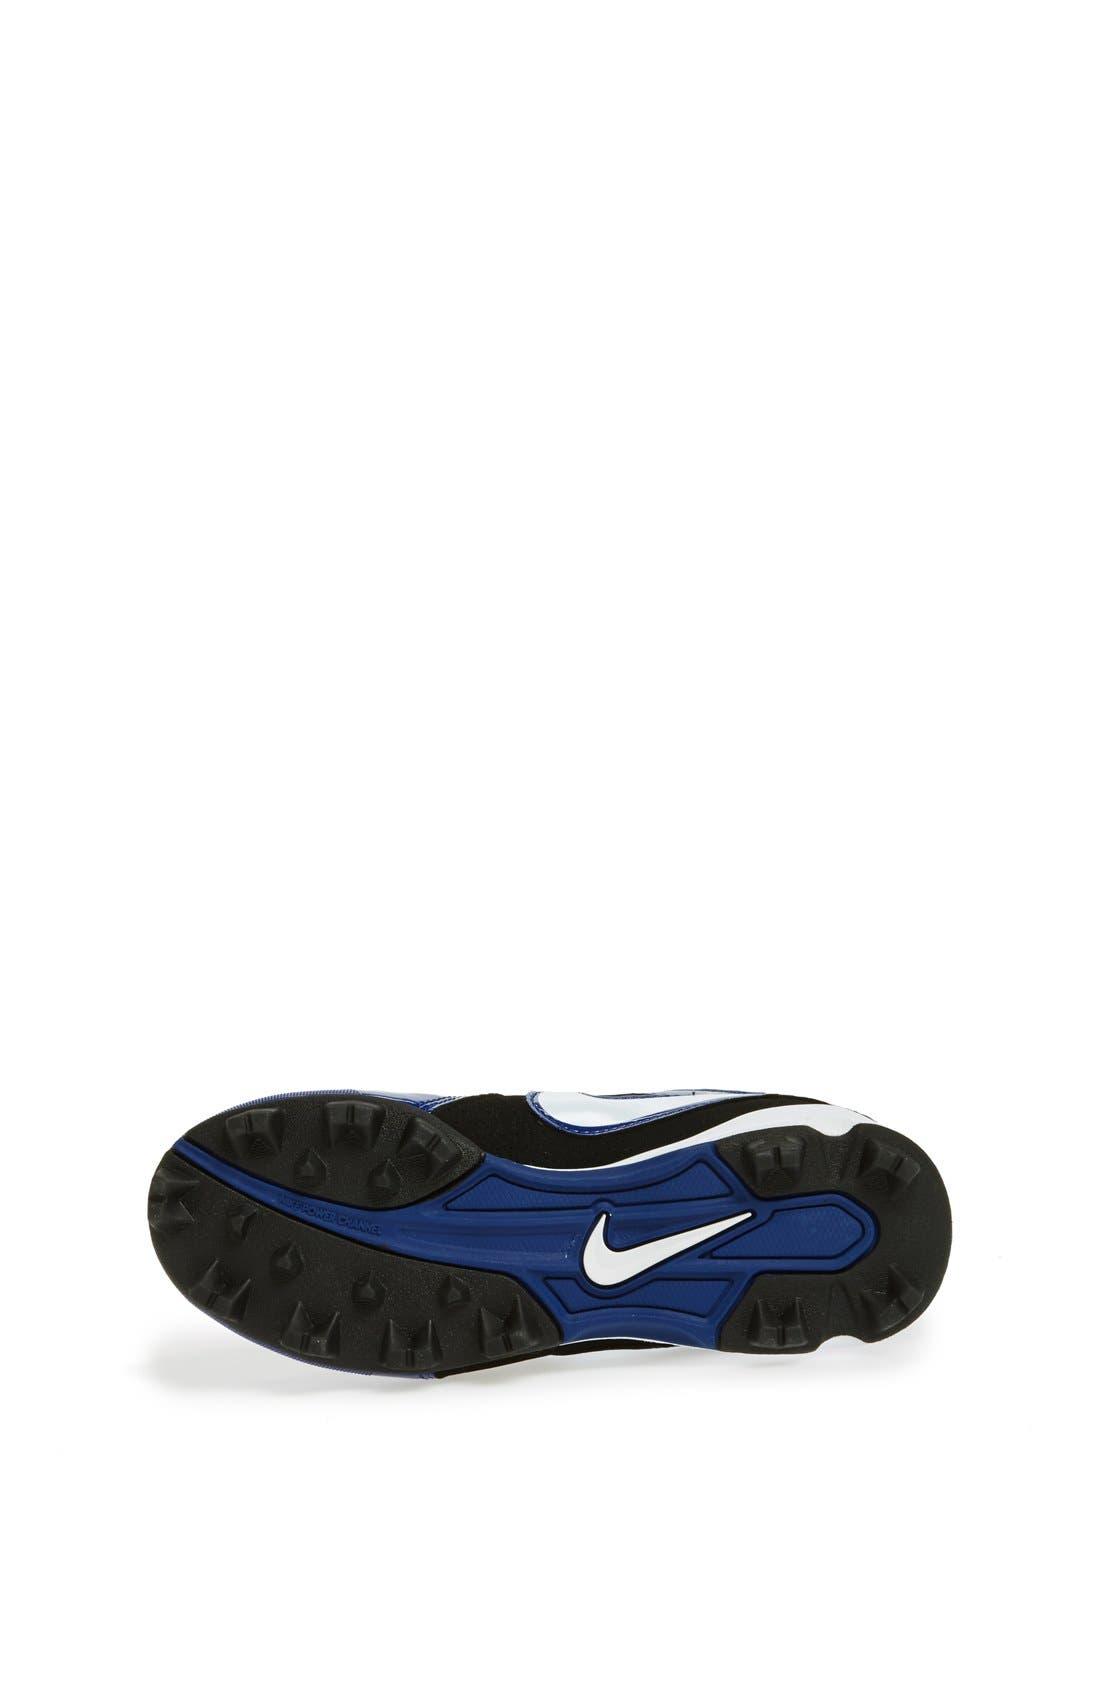 Alternate Image 4  - Nike 'MVP Keystone 3/4' Baseball Cleat (Toddler, Little Kid & Big Kid)